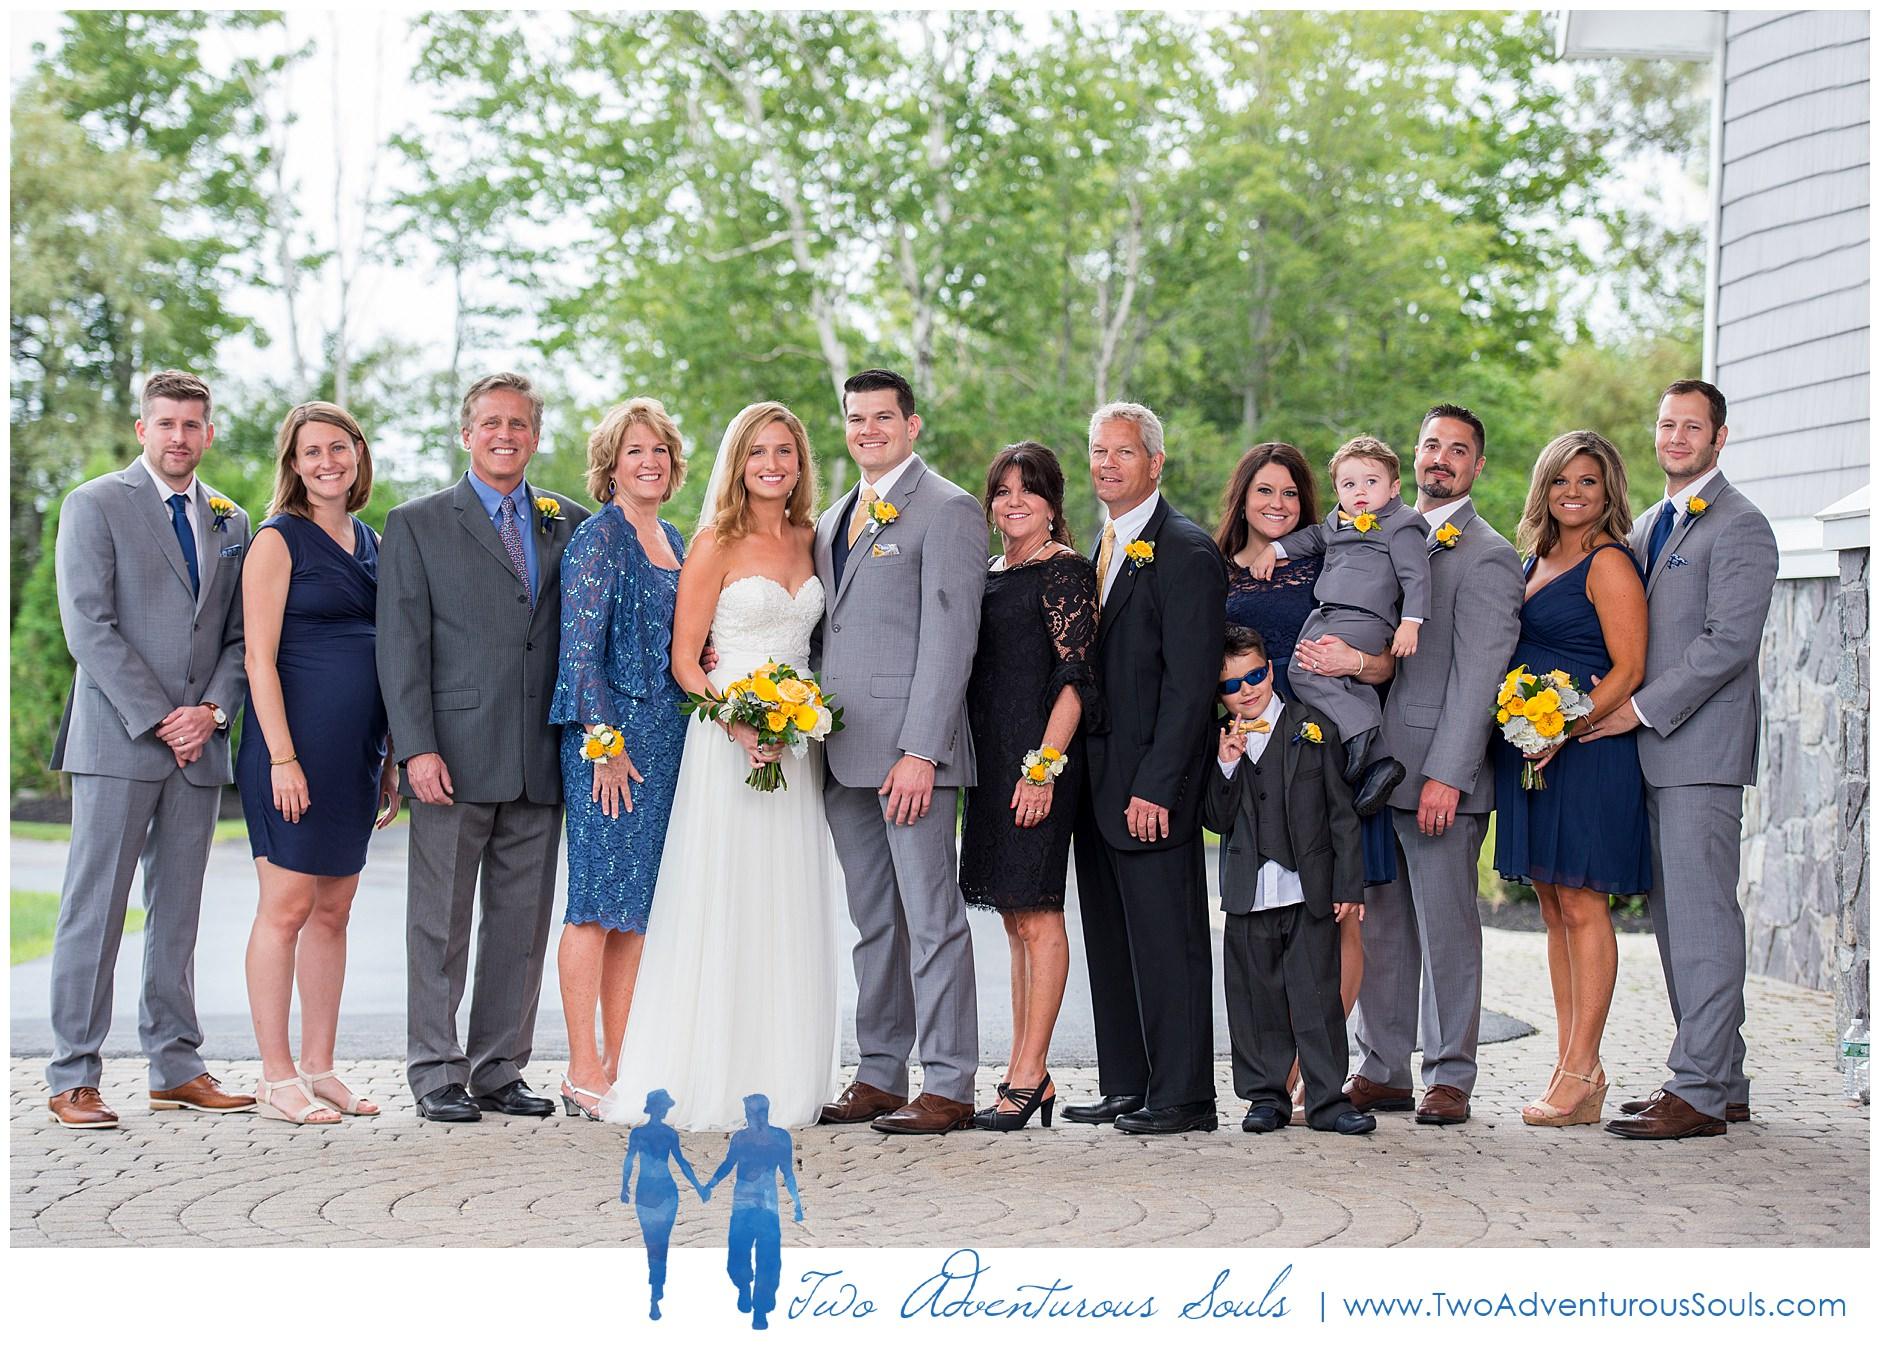 Wedding Day Family Portraits, Wedding Planning, Maine Wedding Photographers, Two Adventurous Souls_WDFPP_0004.jpg